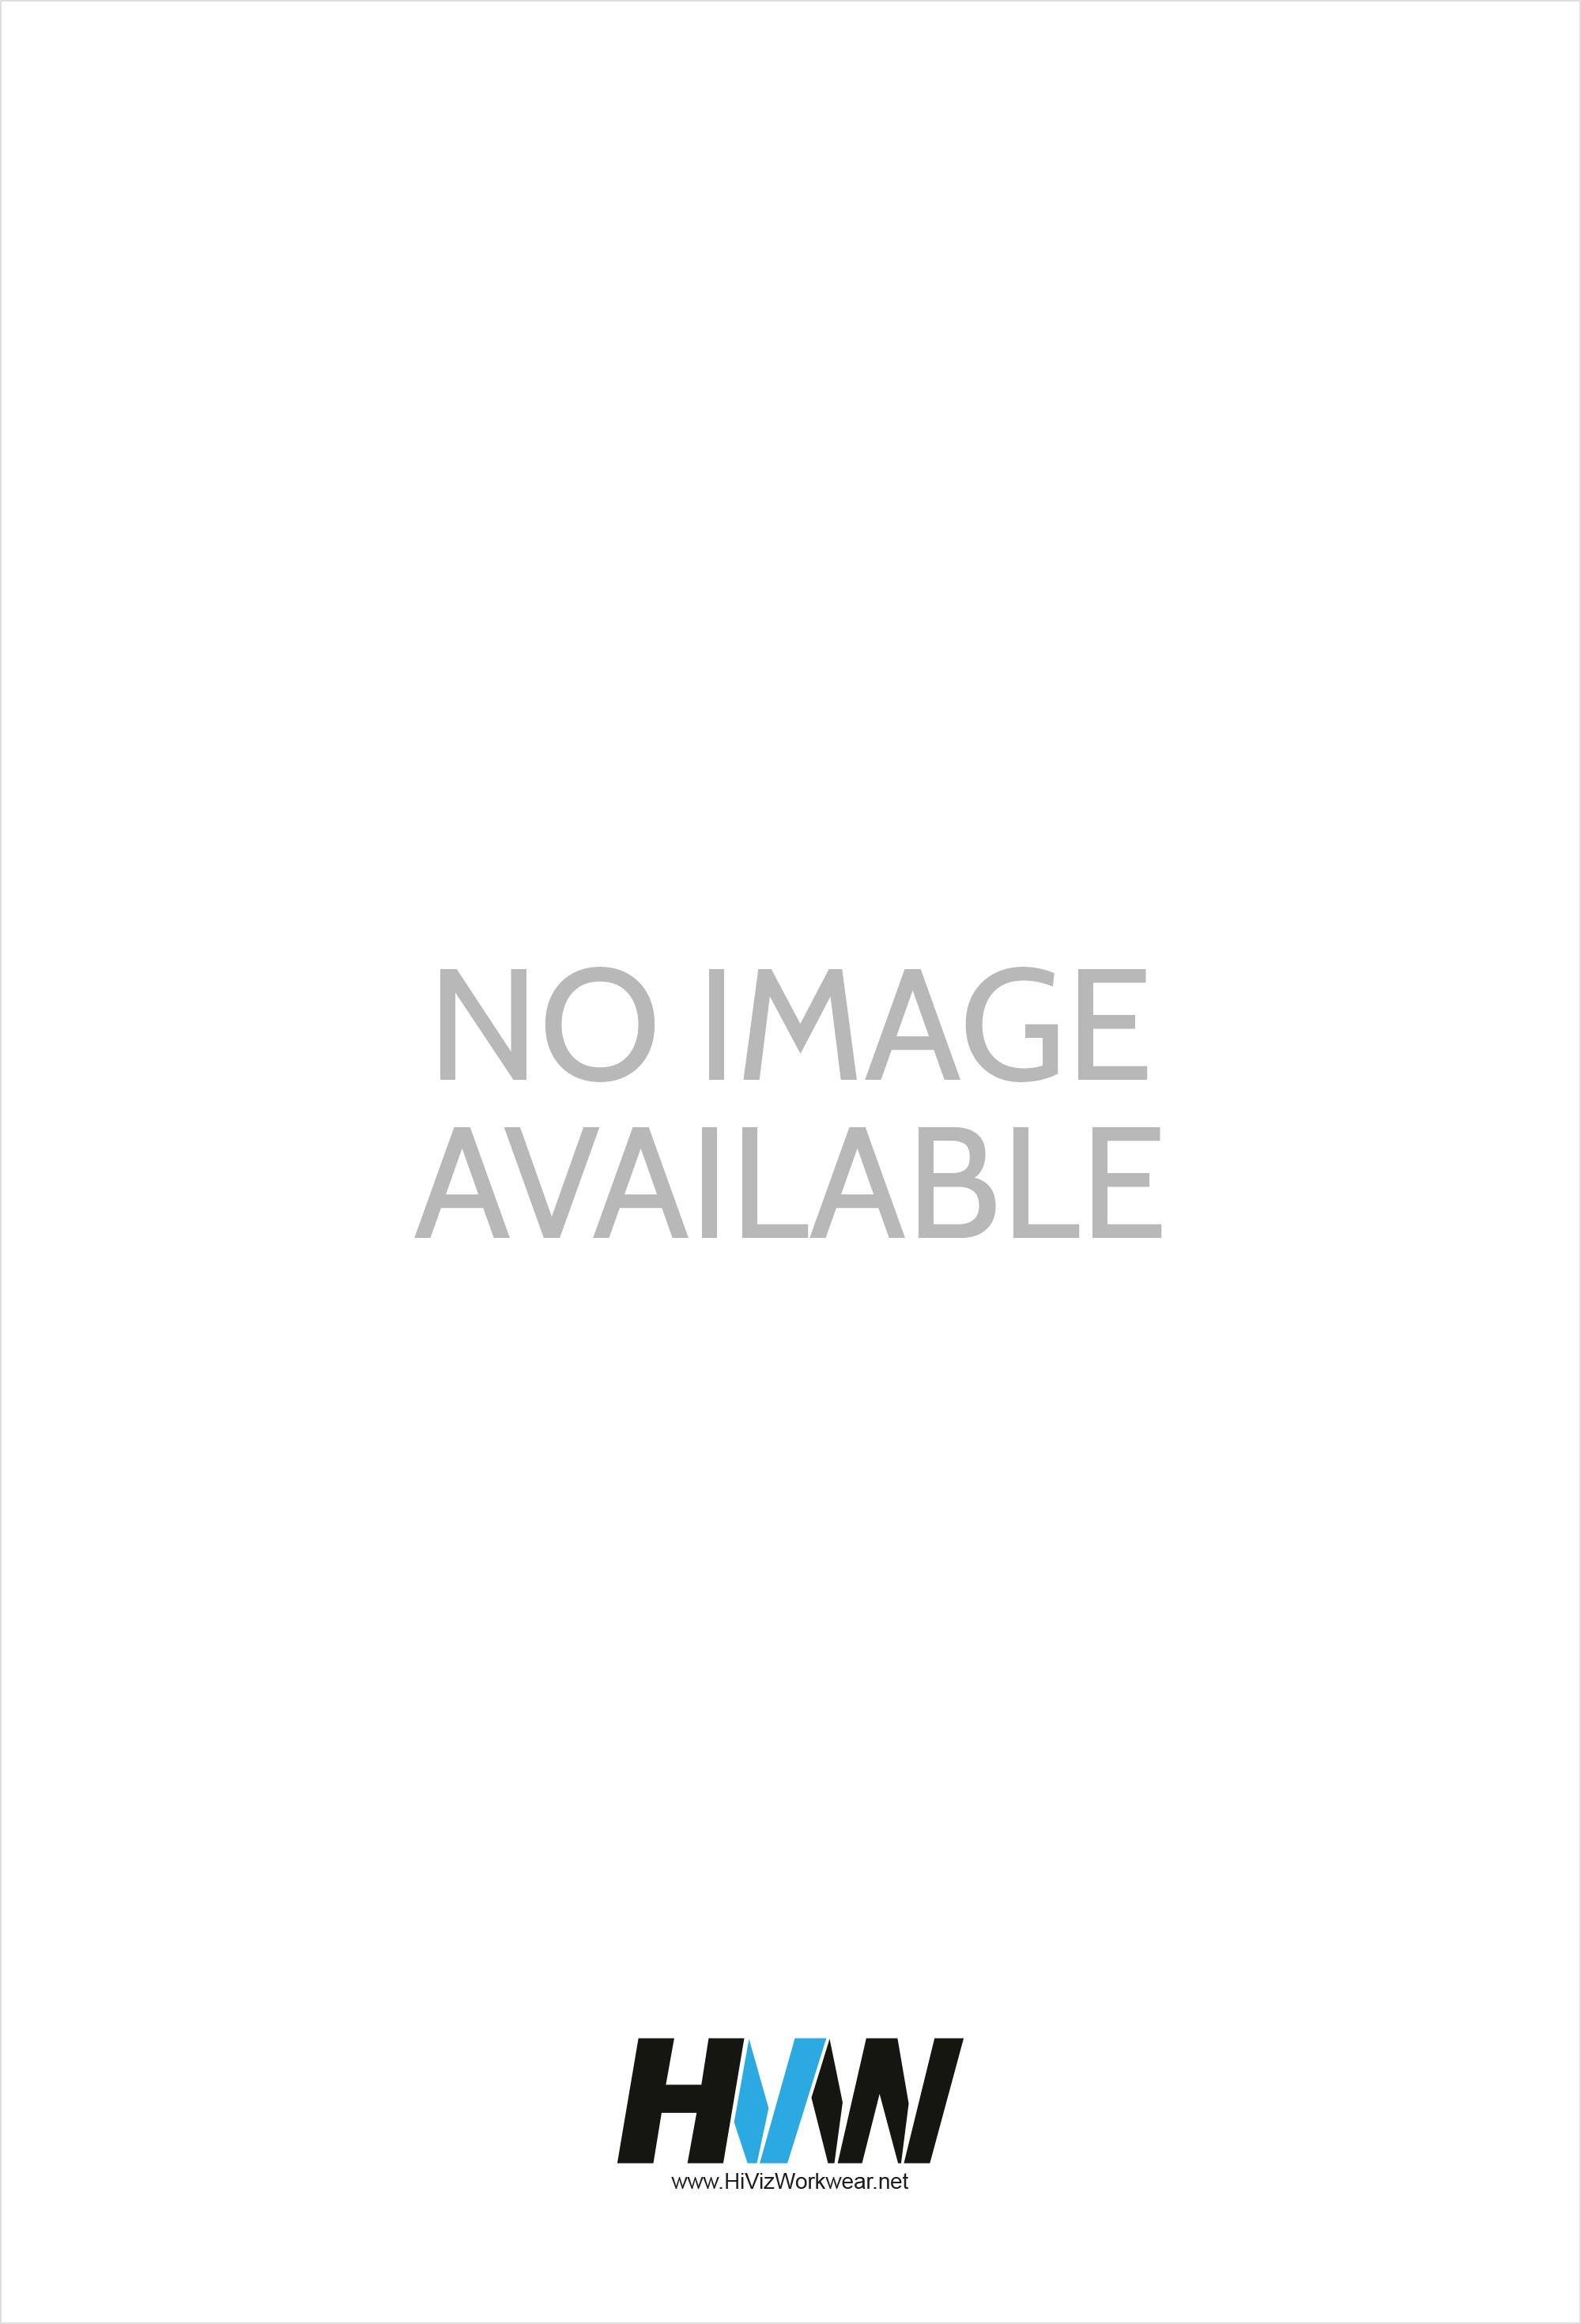 KK189 Contrast Premium Oxford Long Sleeved Shirt  (S To 2XL)